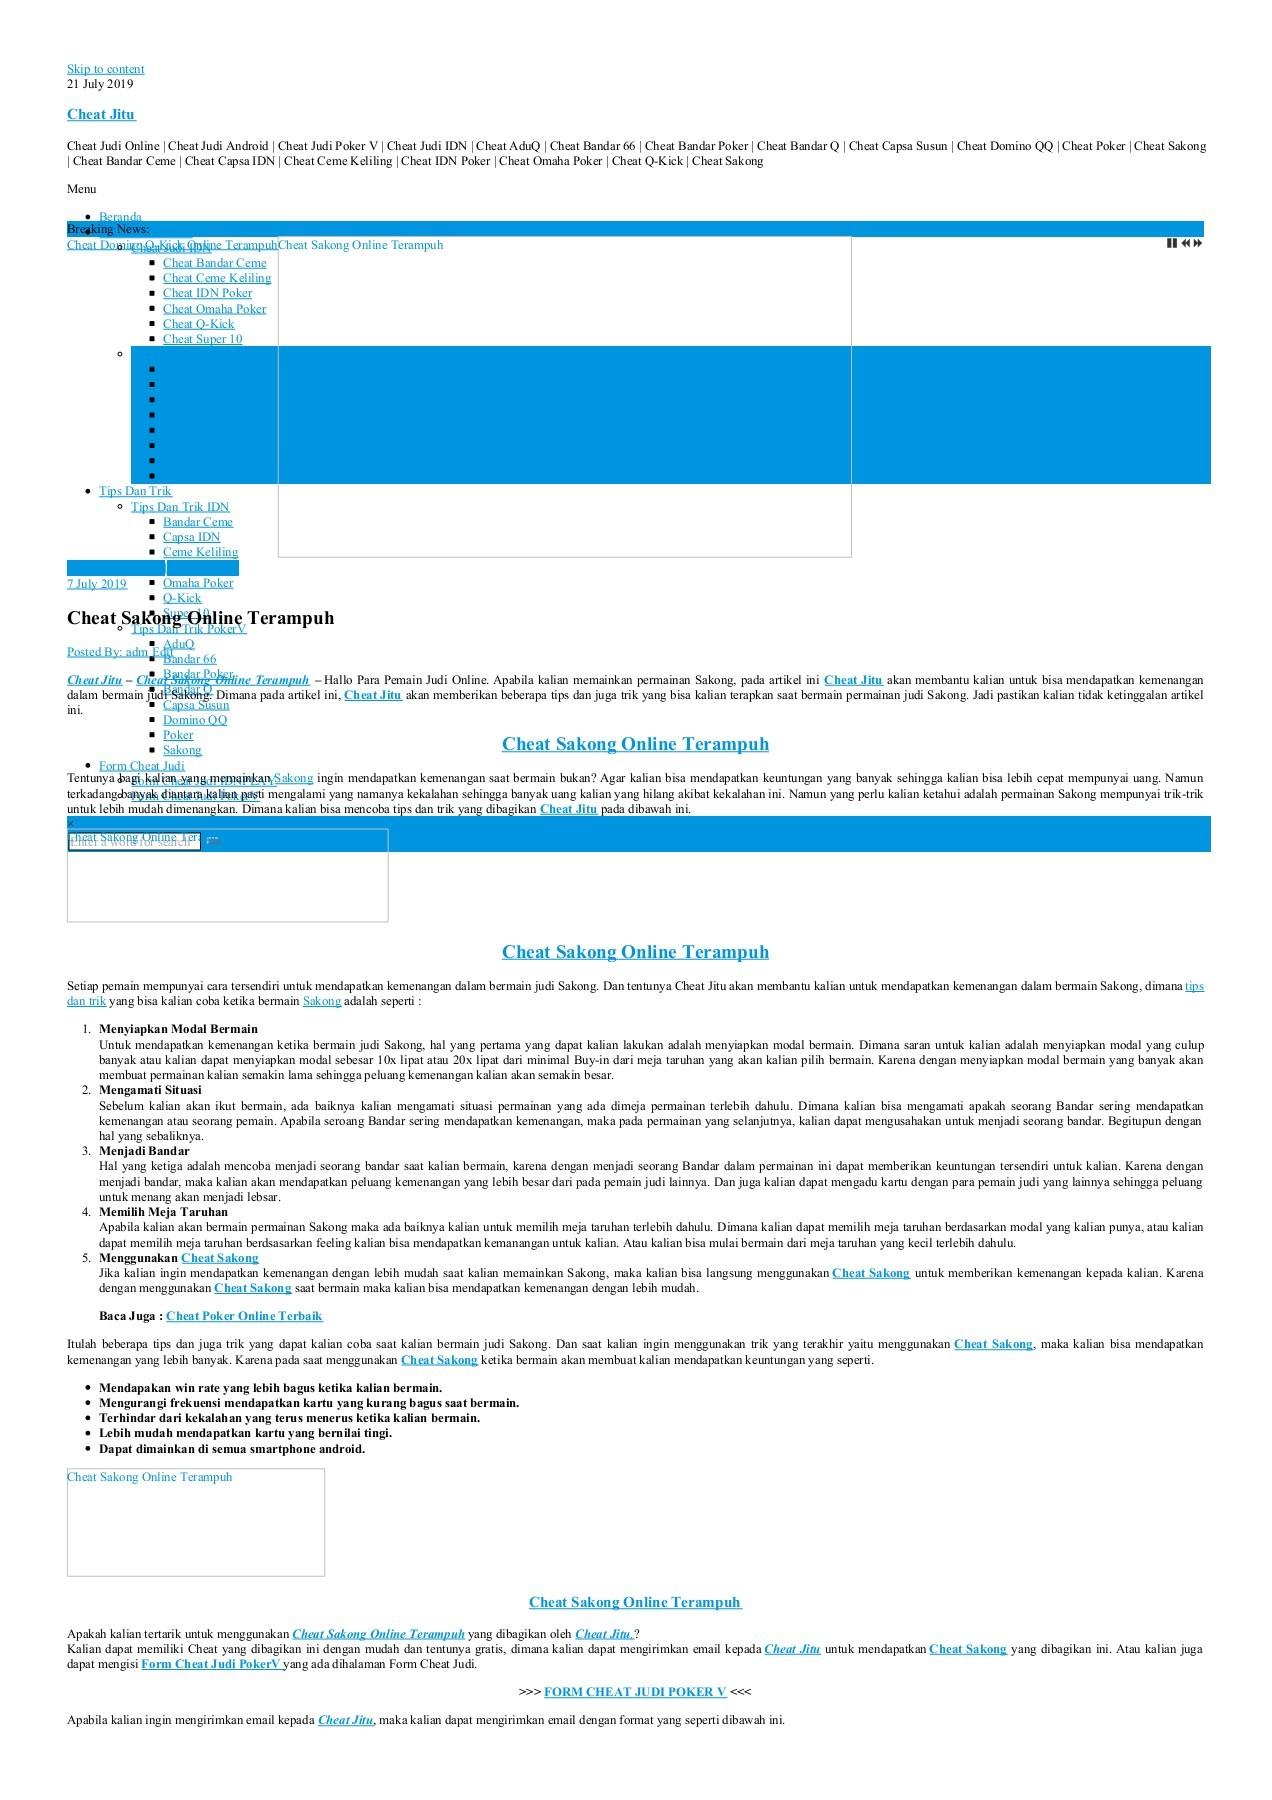 Cheat Sakong Online Terampuh Flip Book Pages 1 3 Pubhtml5